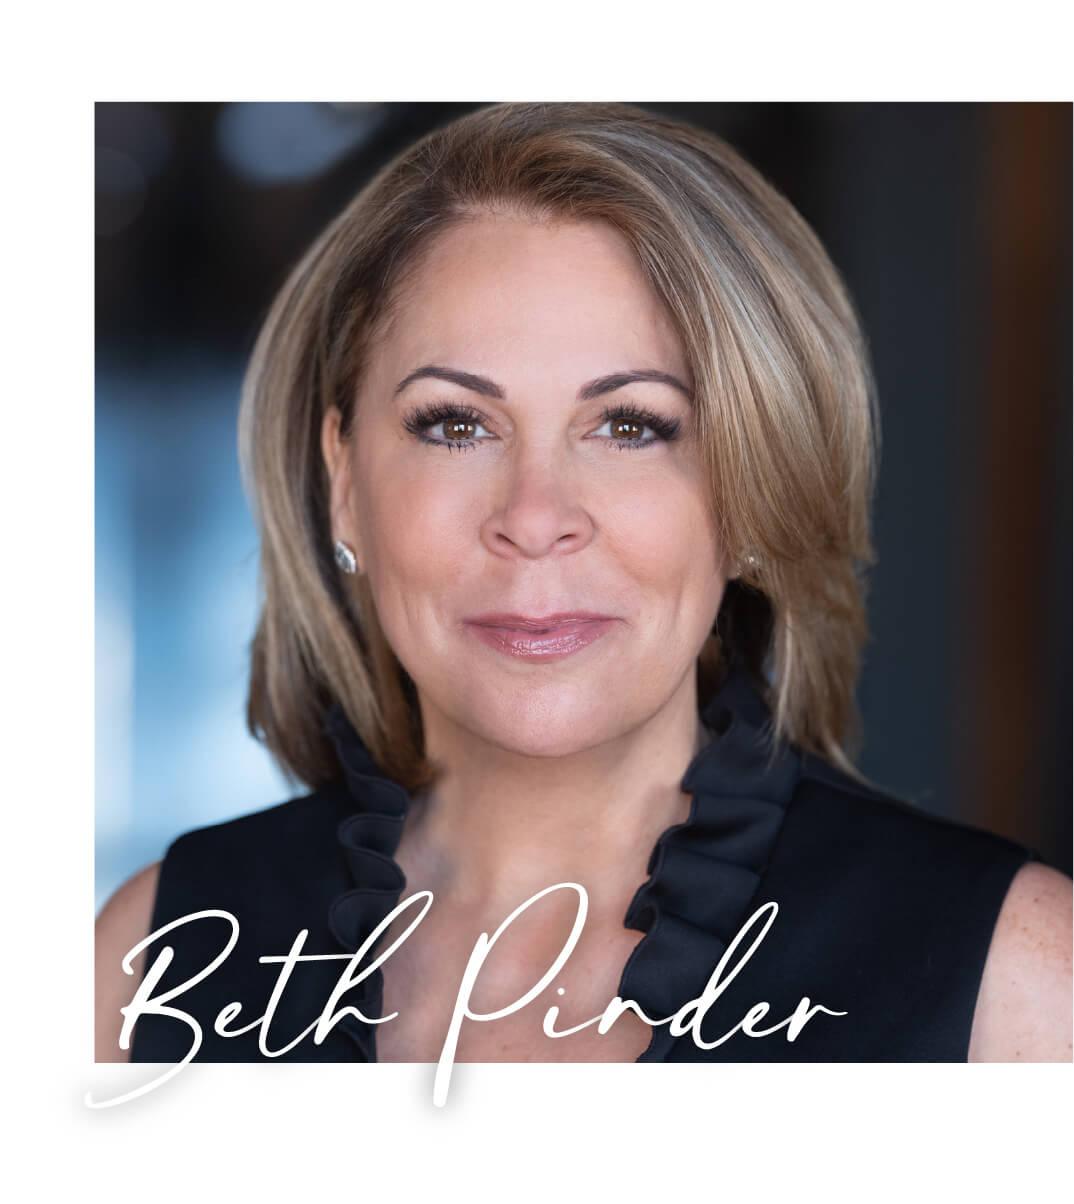 Beth Pinder